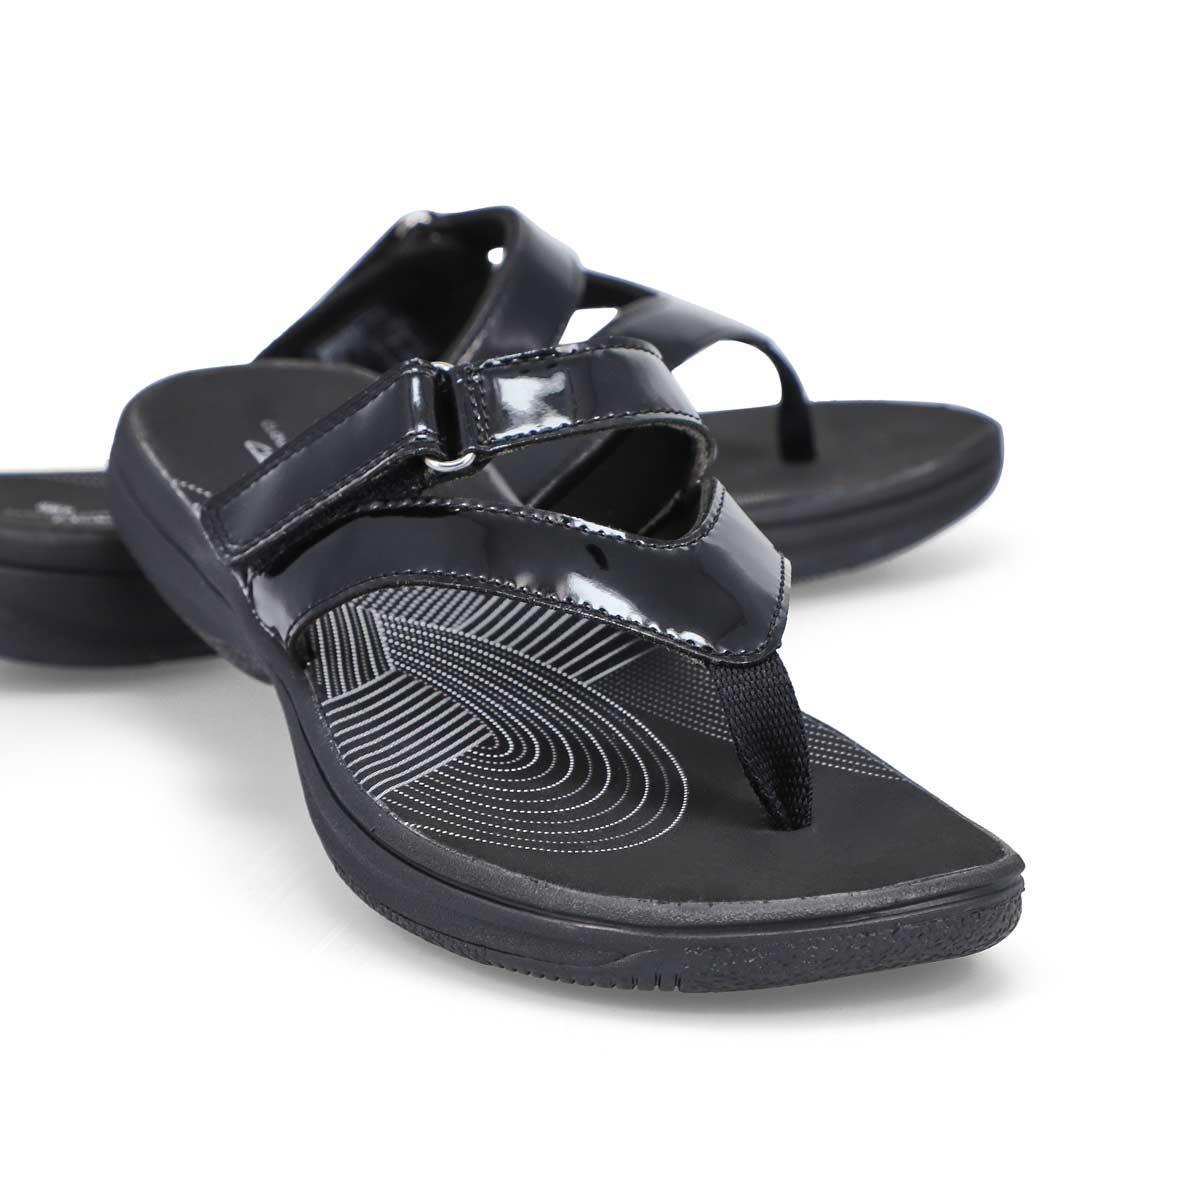 Women's Brinkley Marin Thong Sandal -Black Patent